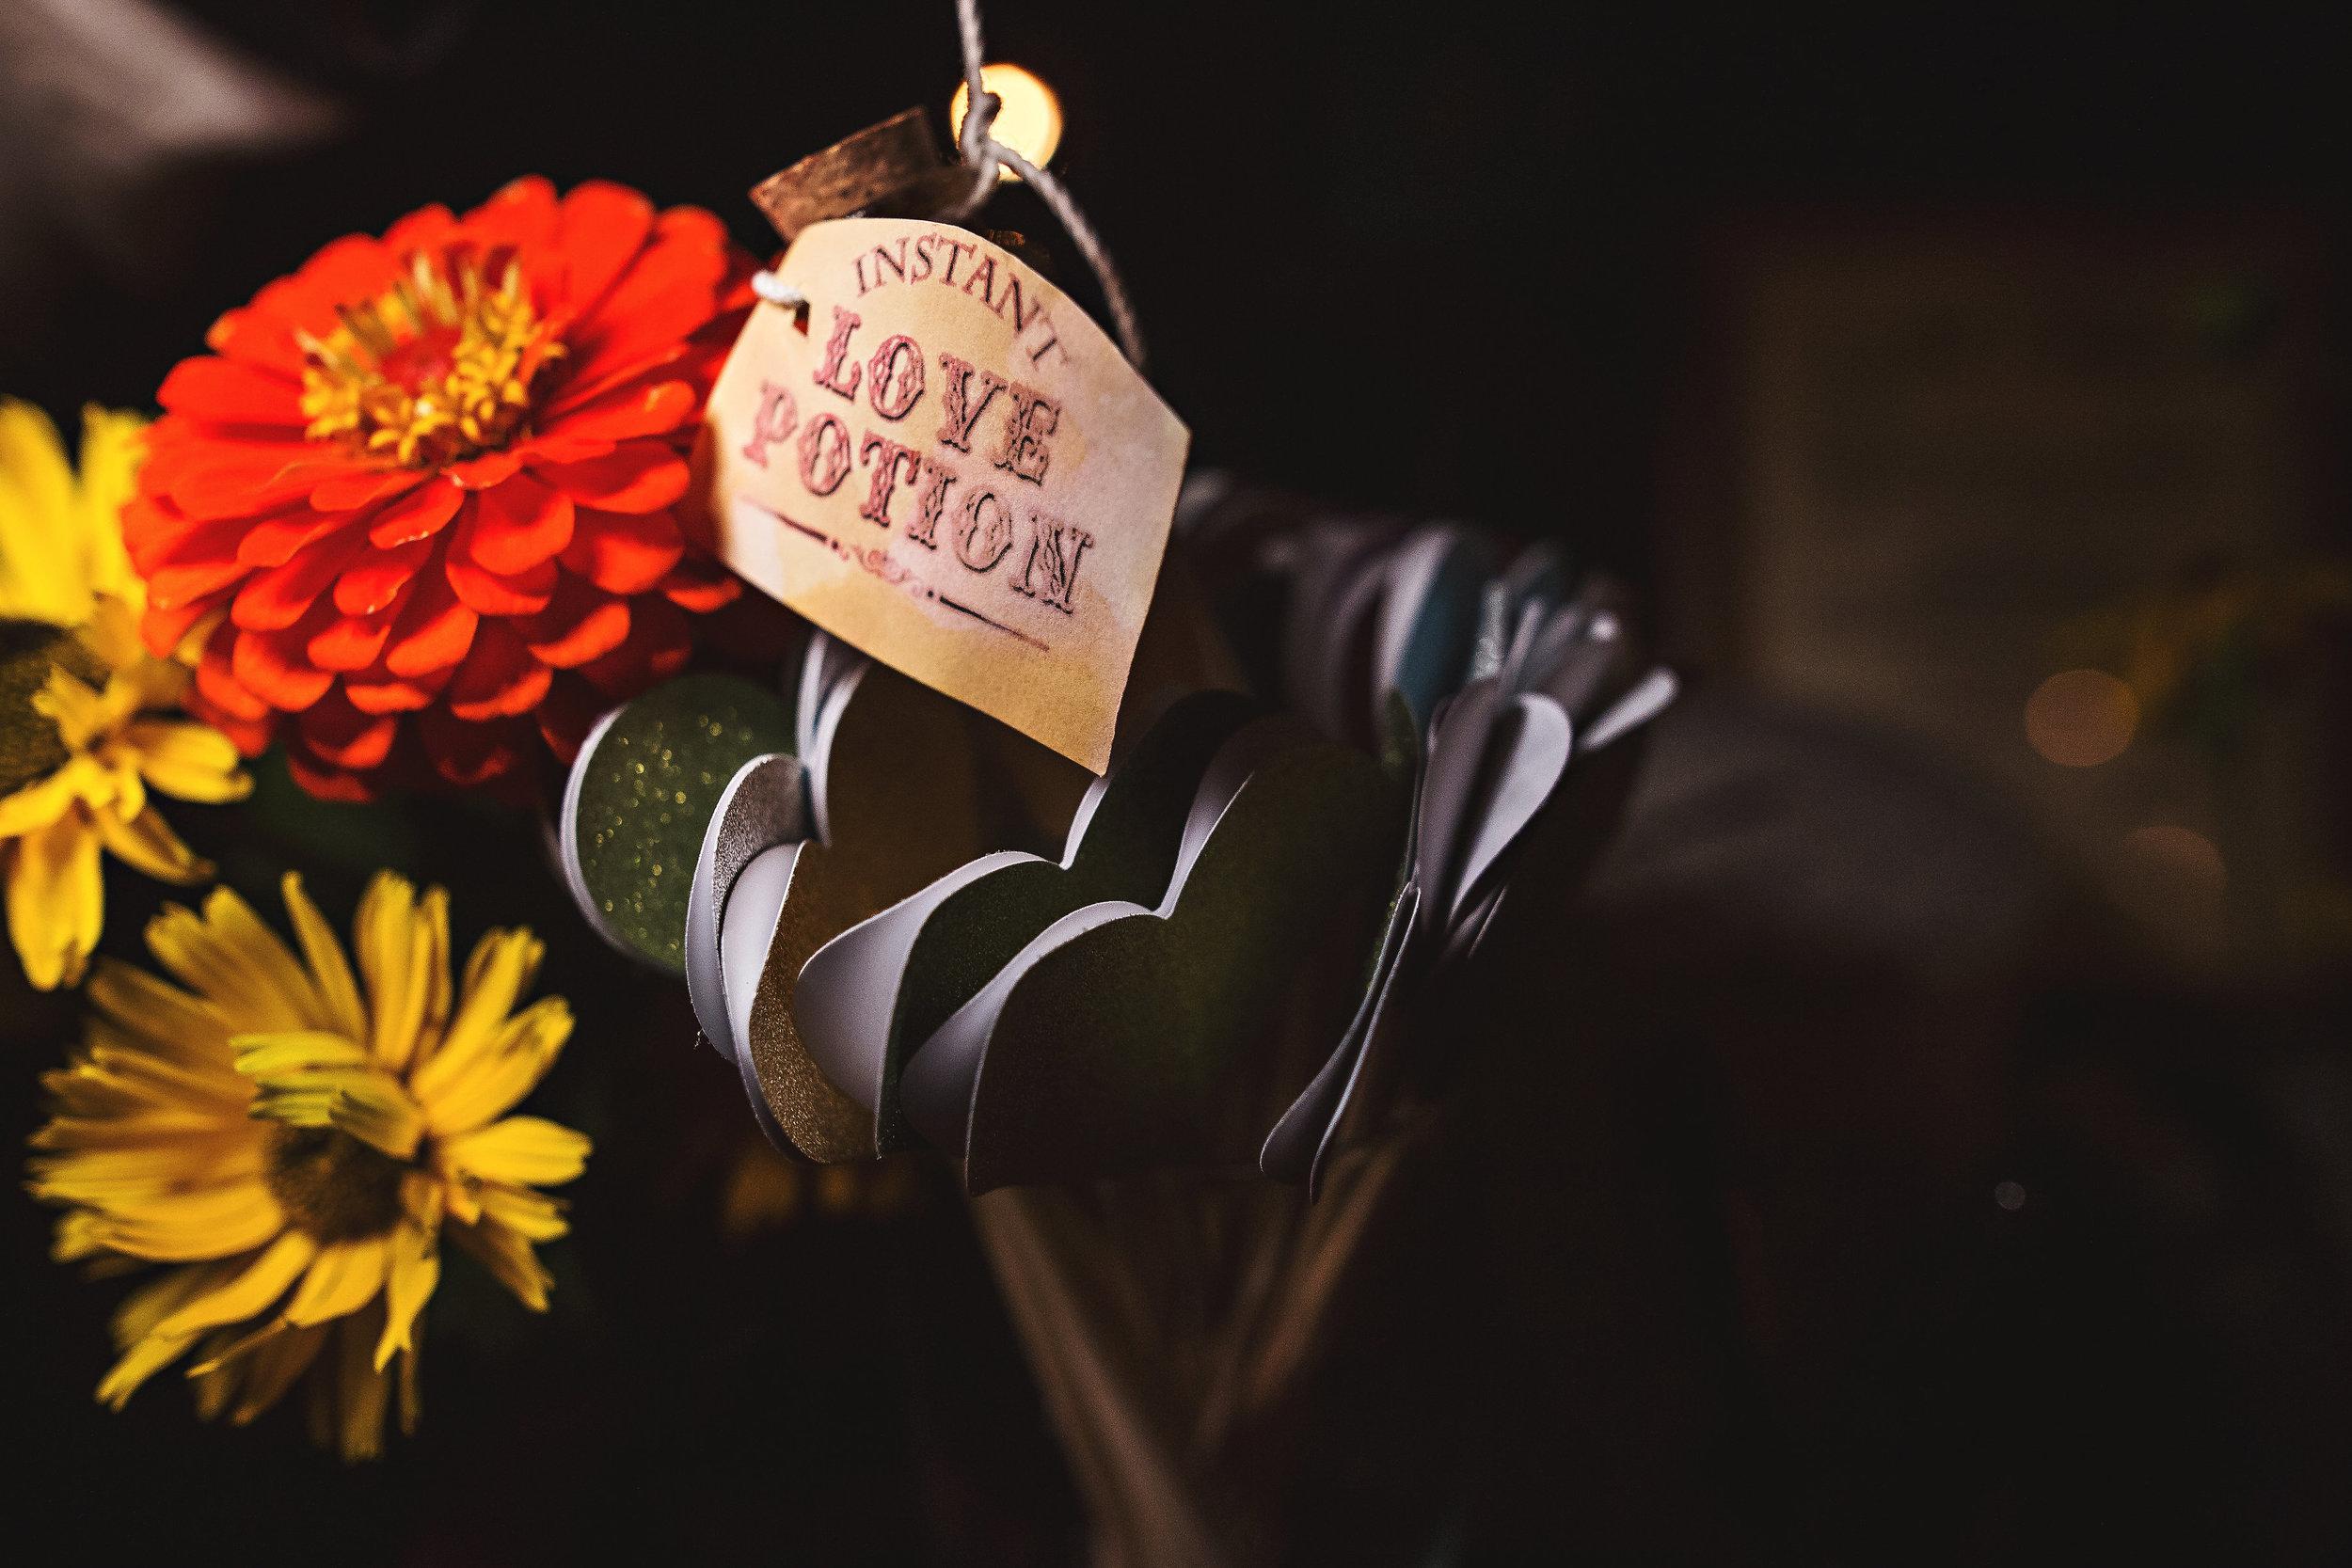 upstate-ny-wedding-jove-meyer-events-inbal-sivan-0138.jpg